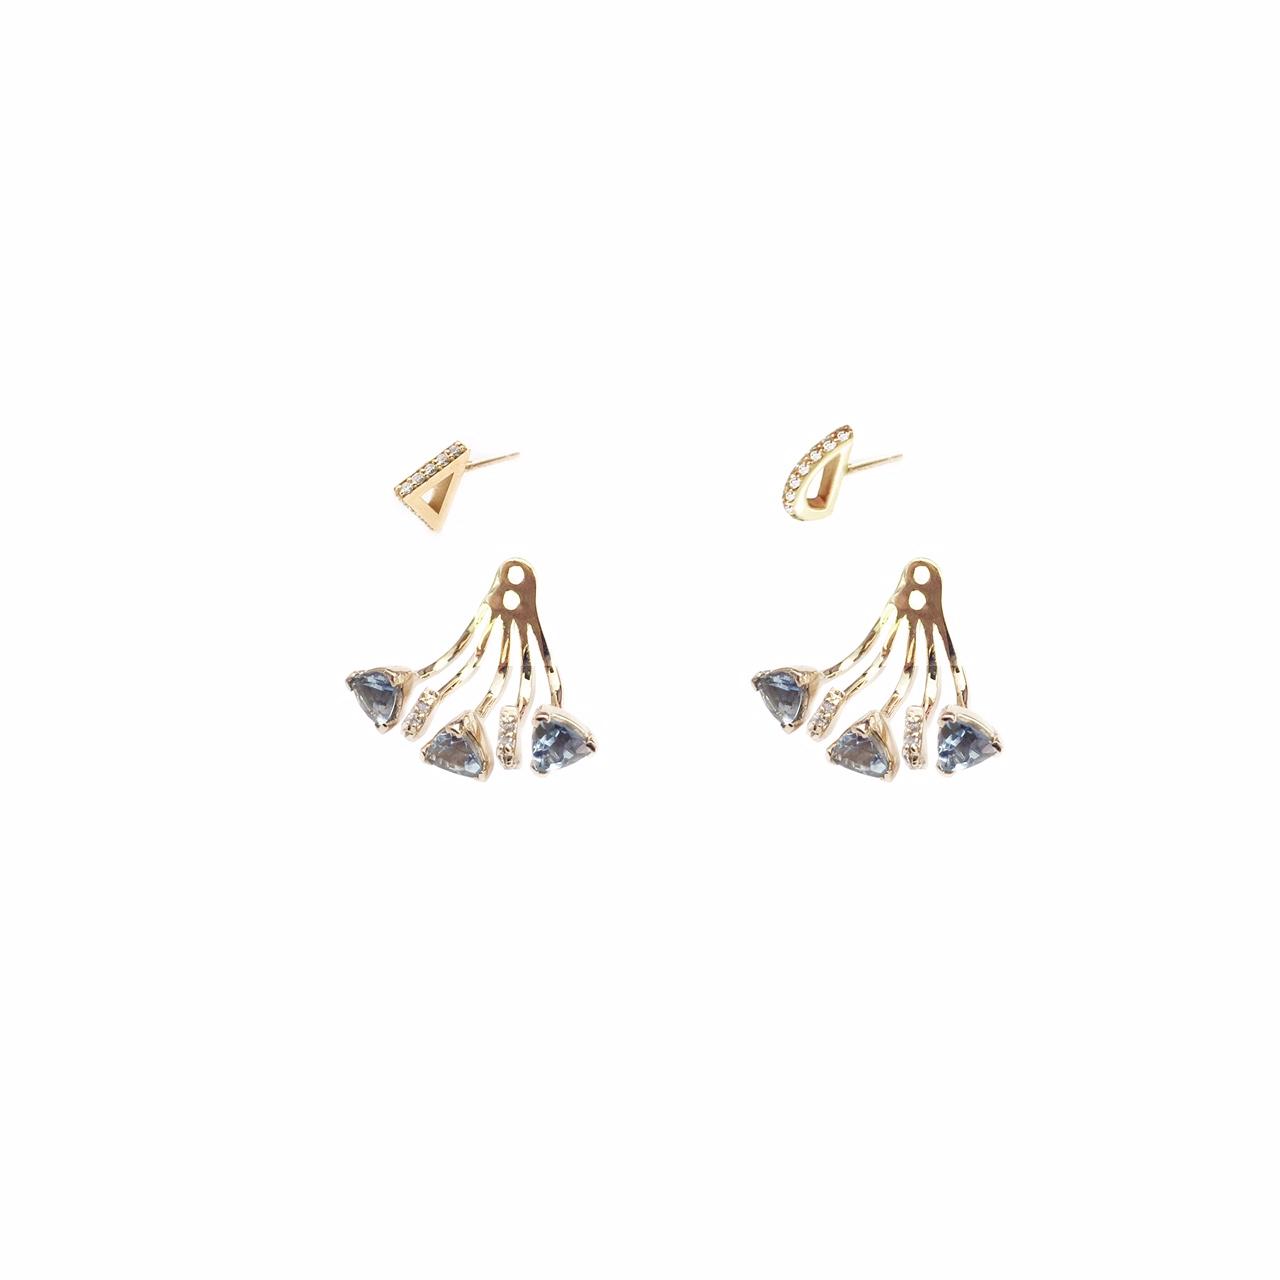 Marta E04126 Trillion Mini Ear Jacket with Triangle Studs-YG-AQ.jpg